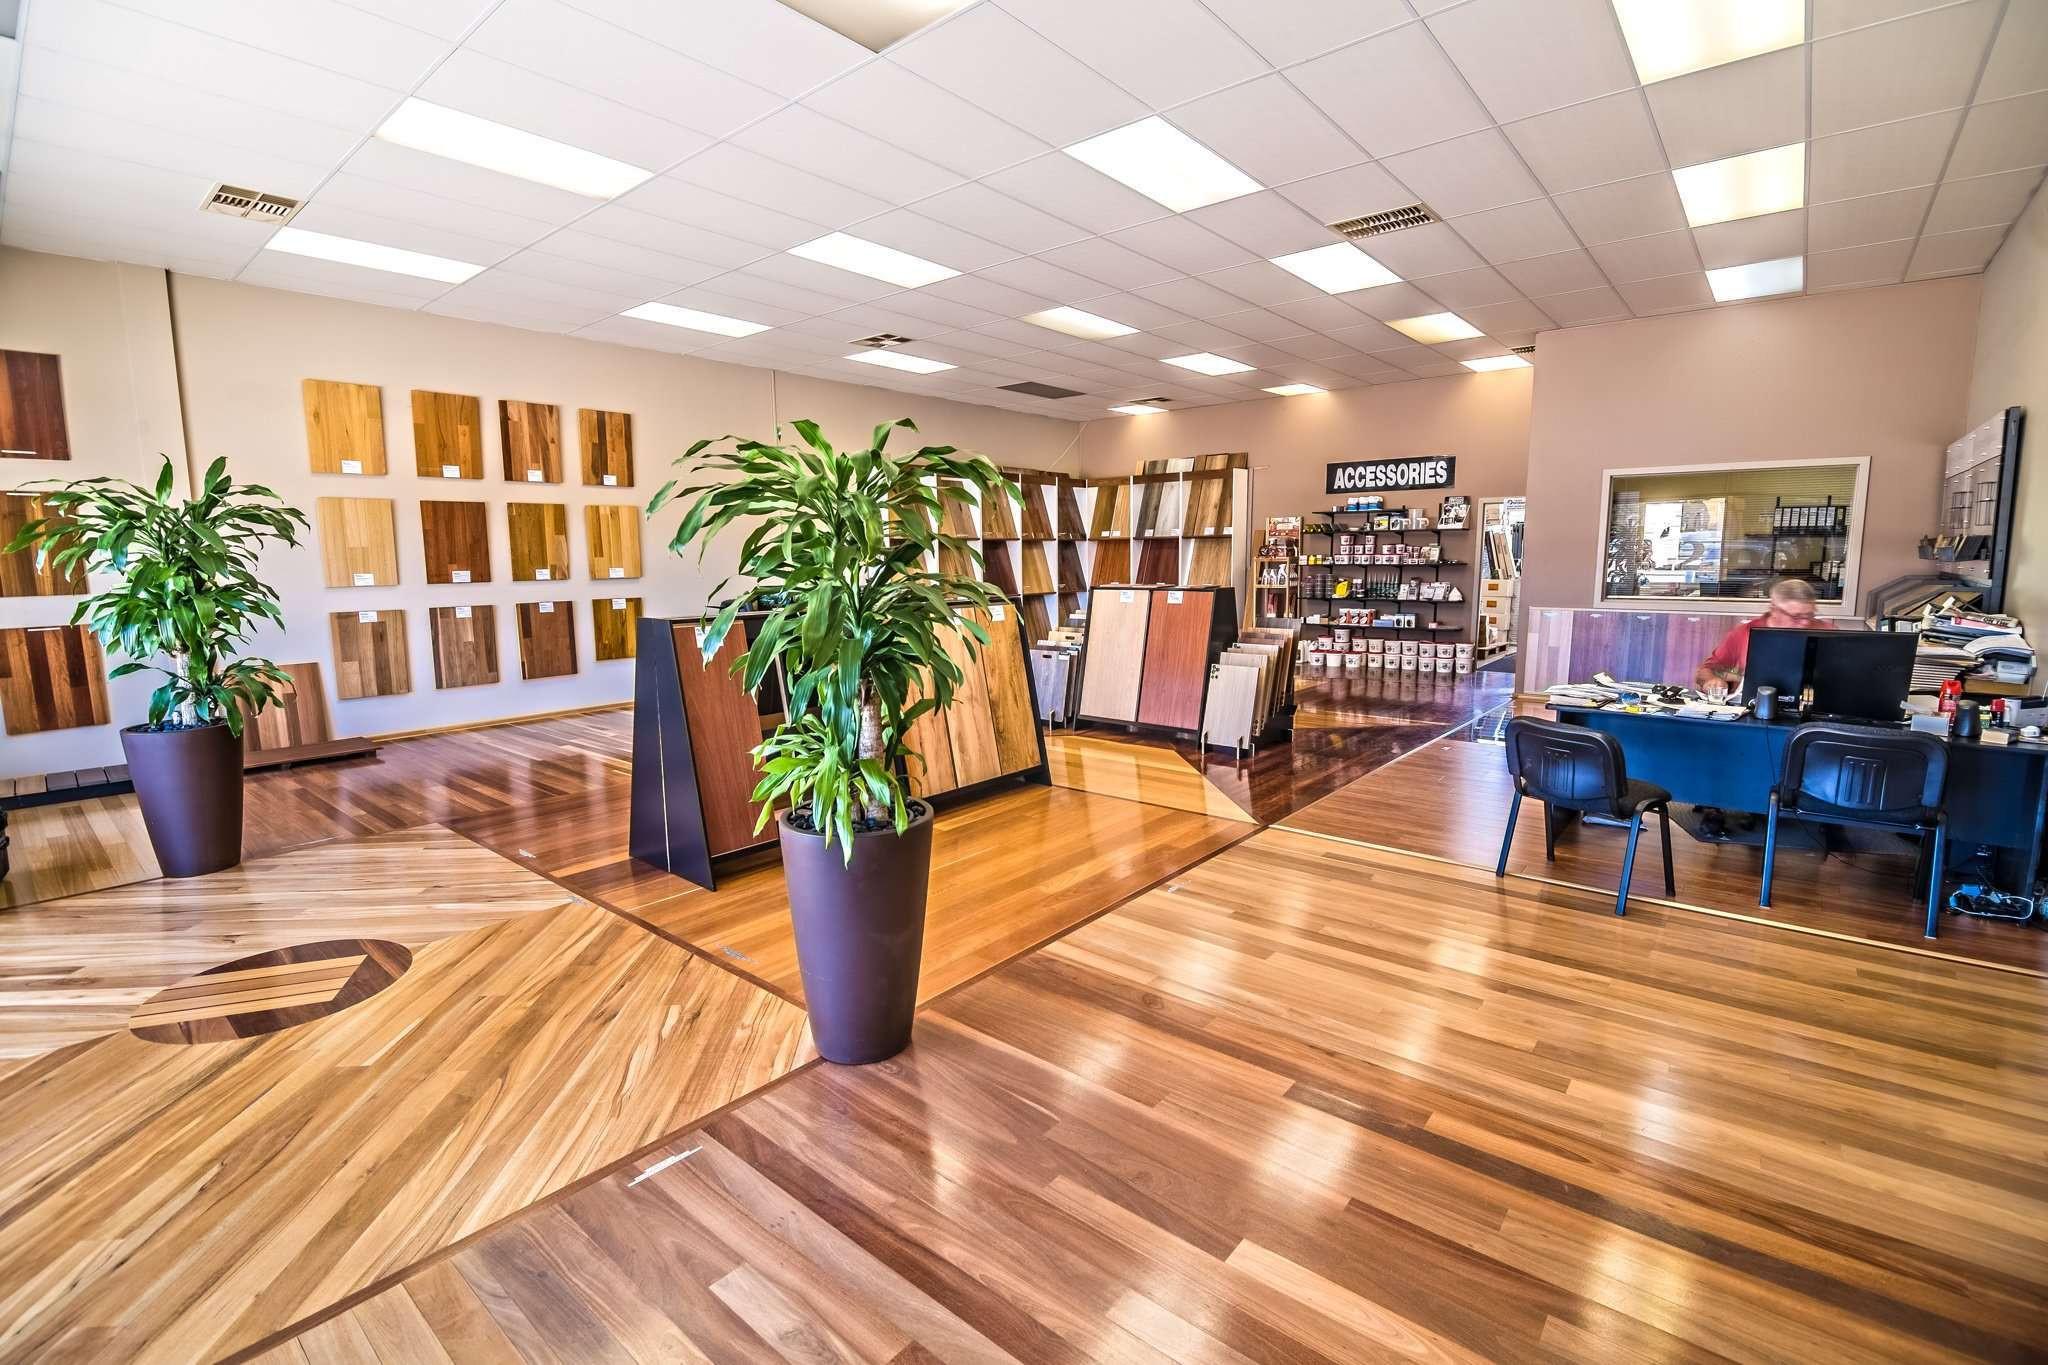 hardwood flooring brisbane prices of wood floor price lists a1 wood floors regarding 4 1451 albany hwy cannington